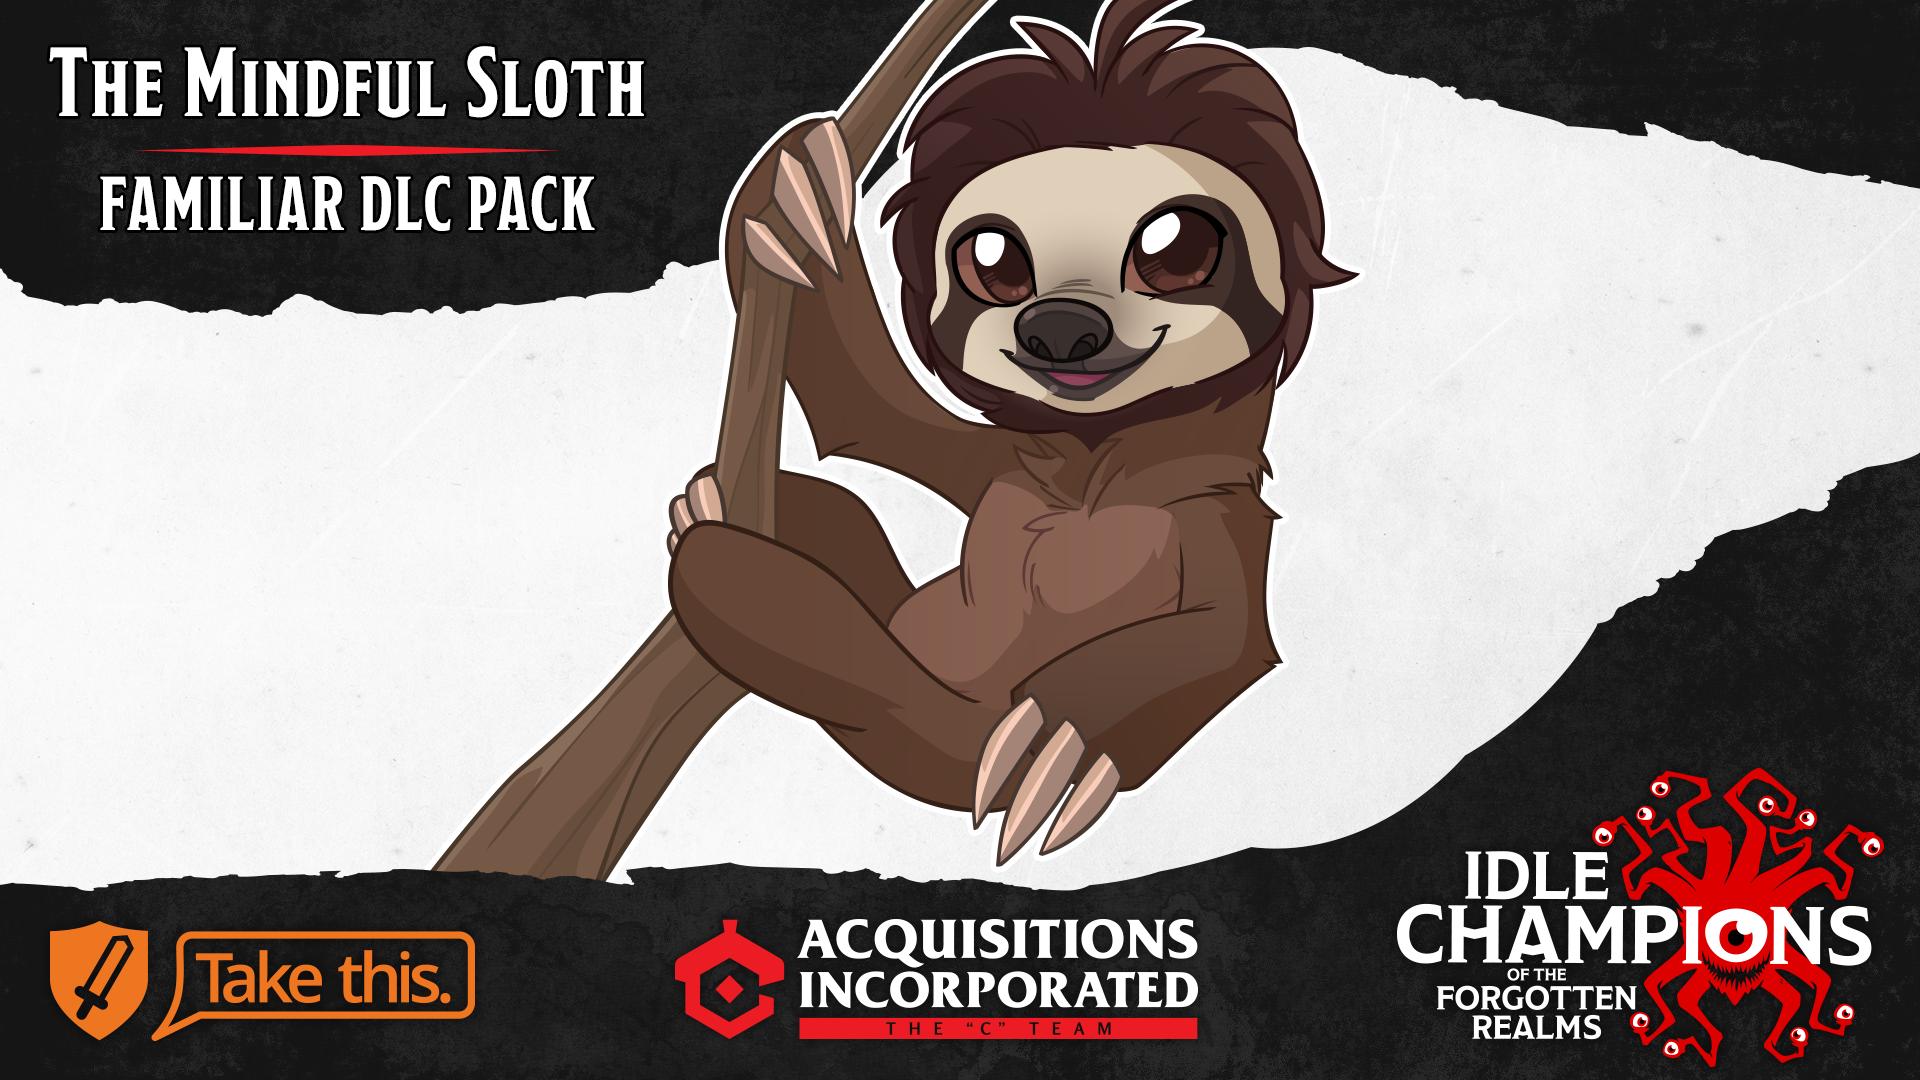 Dungeons & Dragons Mindful Sloth Familiar Take This